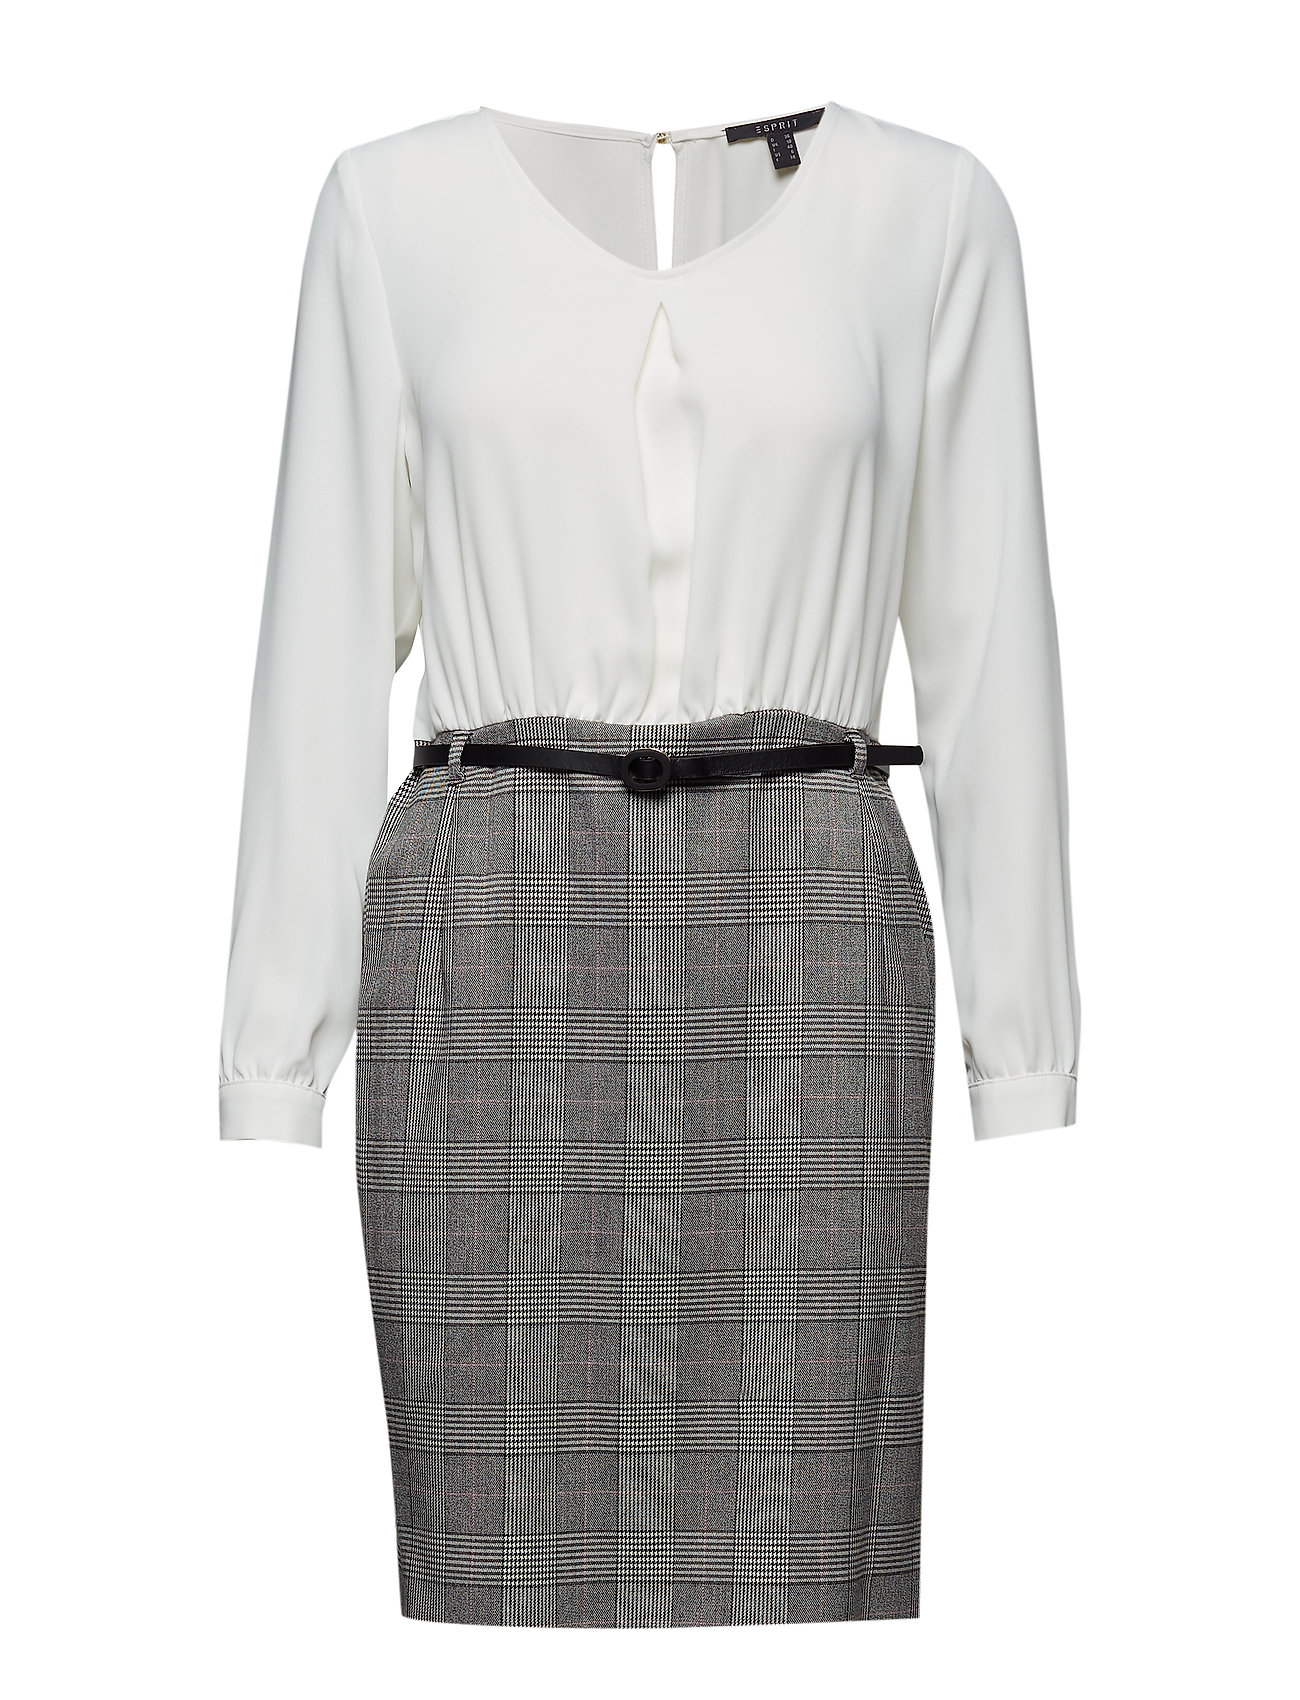 2a60a632a1c76 Dresses Woven (Off White) (£34.50) - Esprit Collection -   Boozt.com